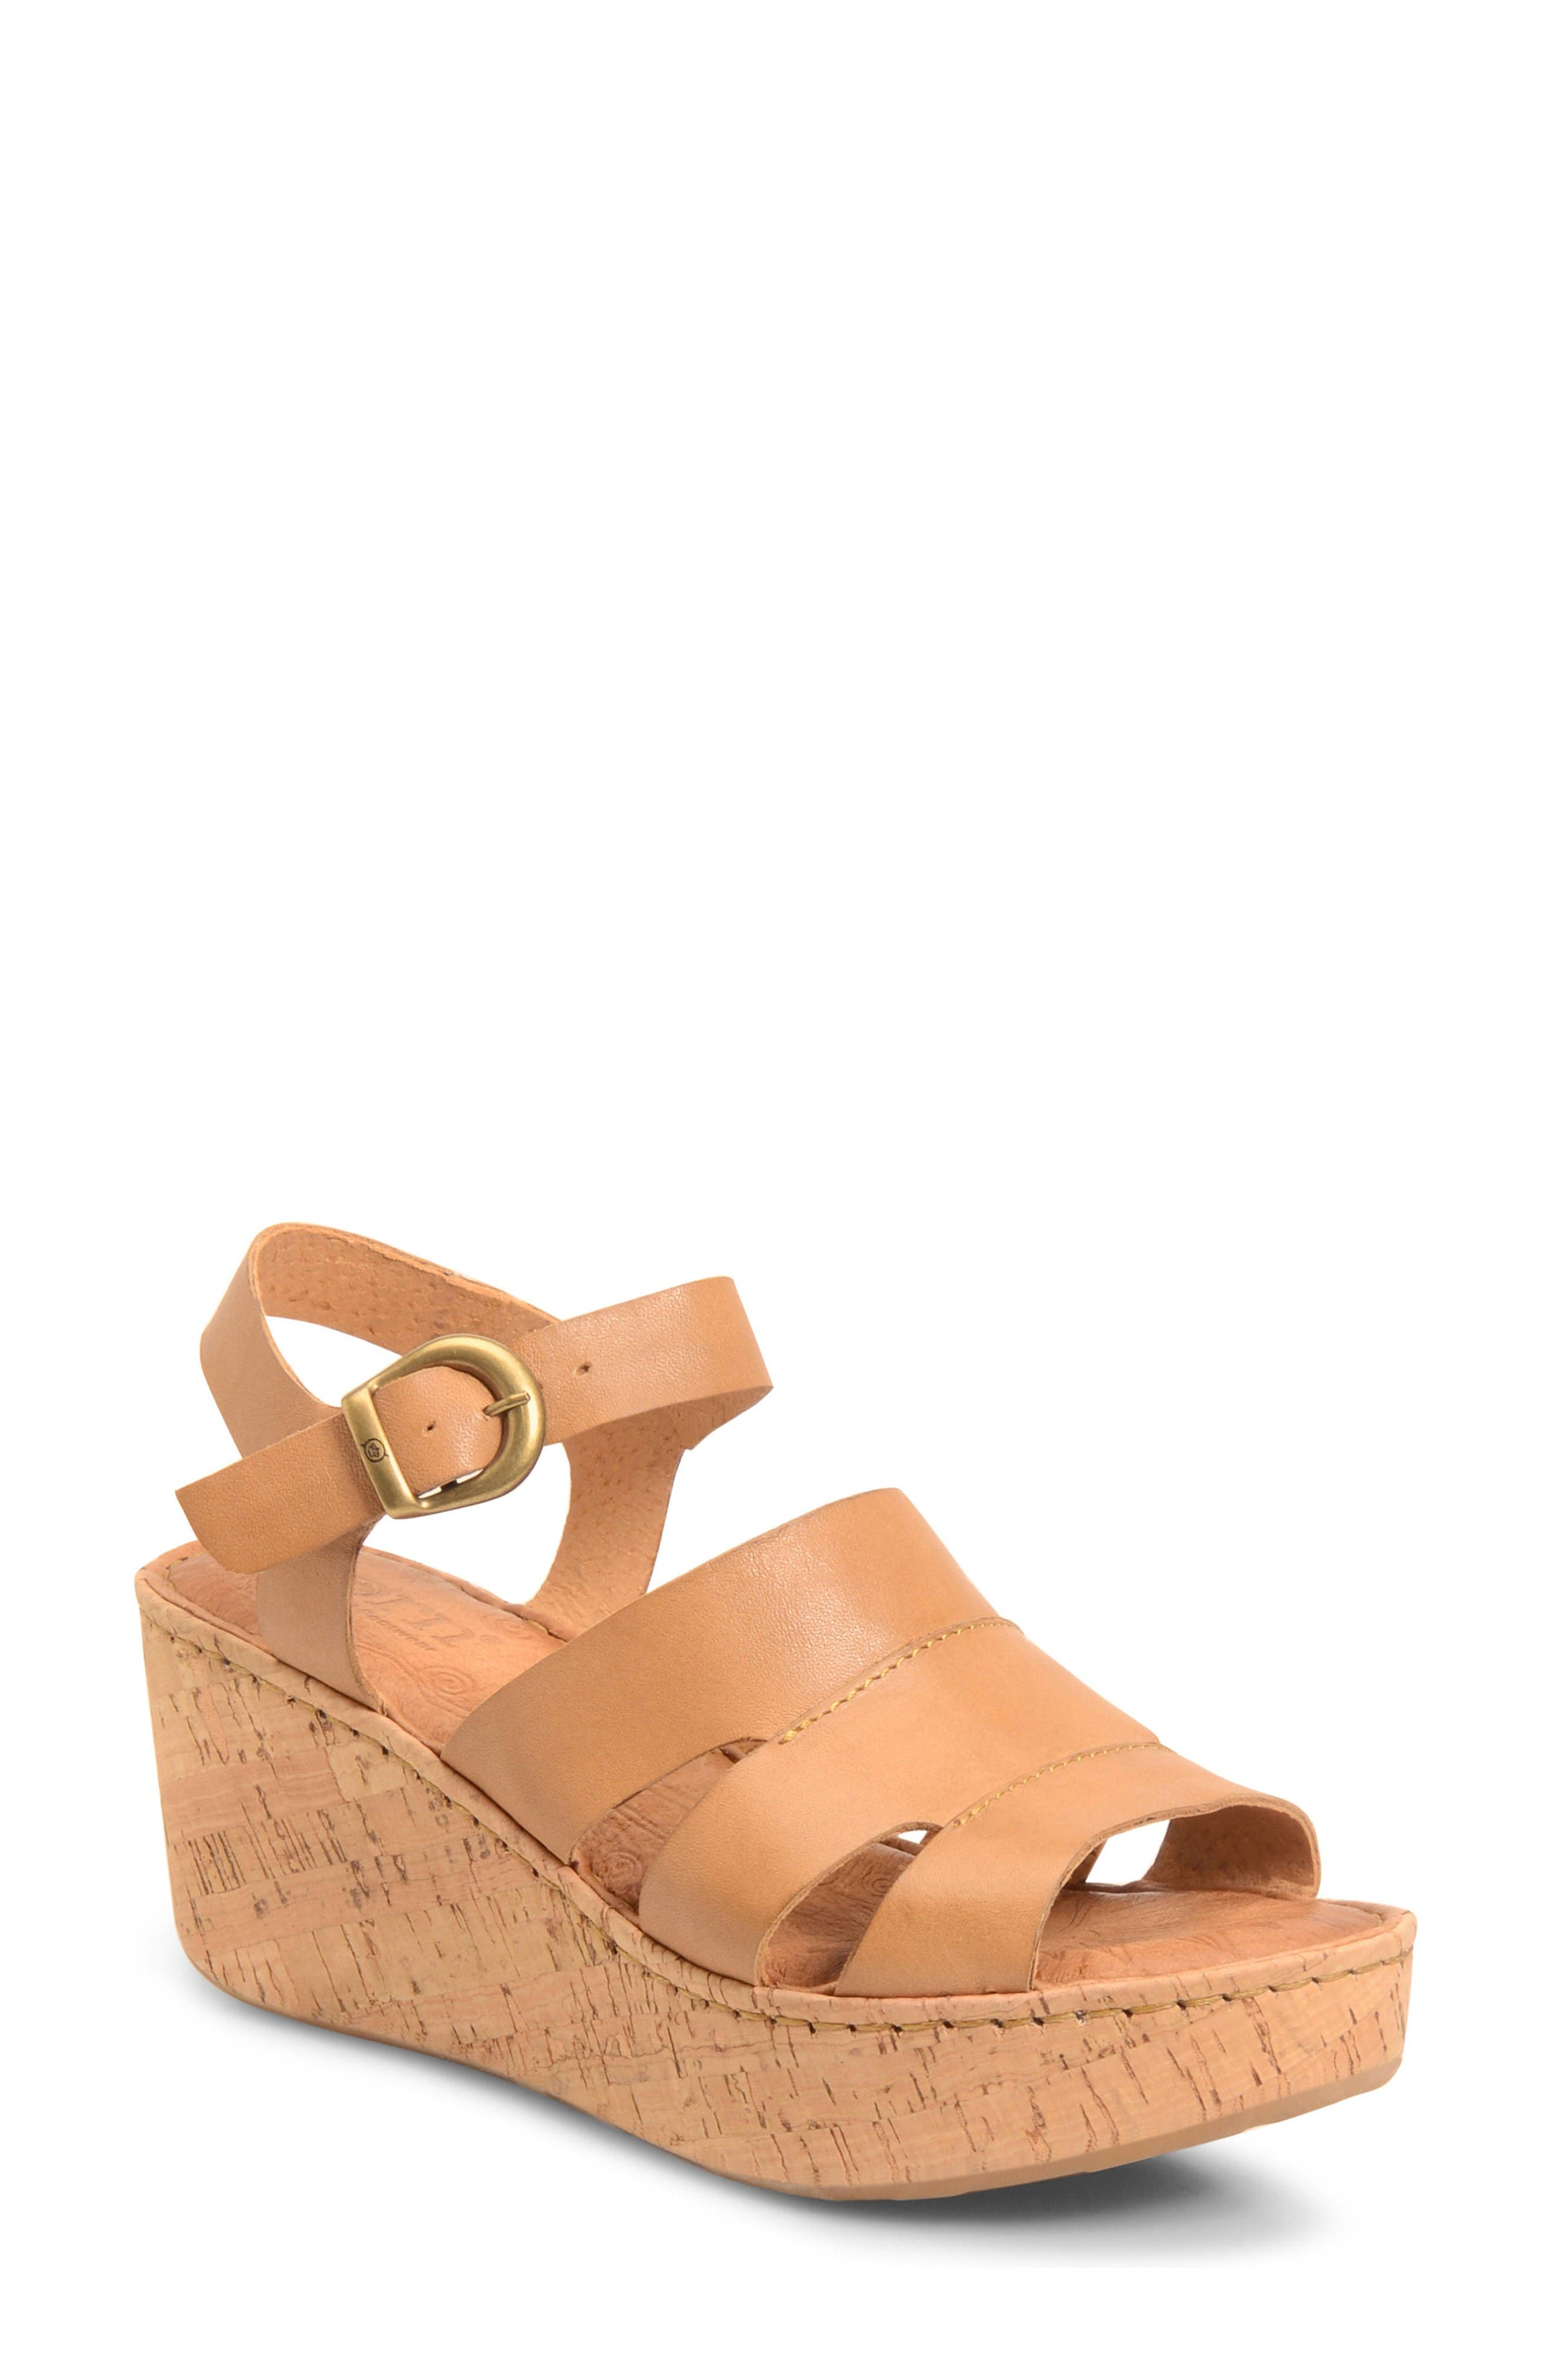 Alternate Image 1 Selected - Børn Anori Platform Wedge Sandal (Women)